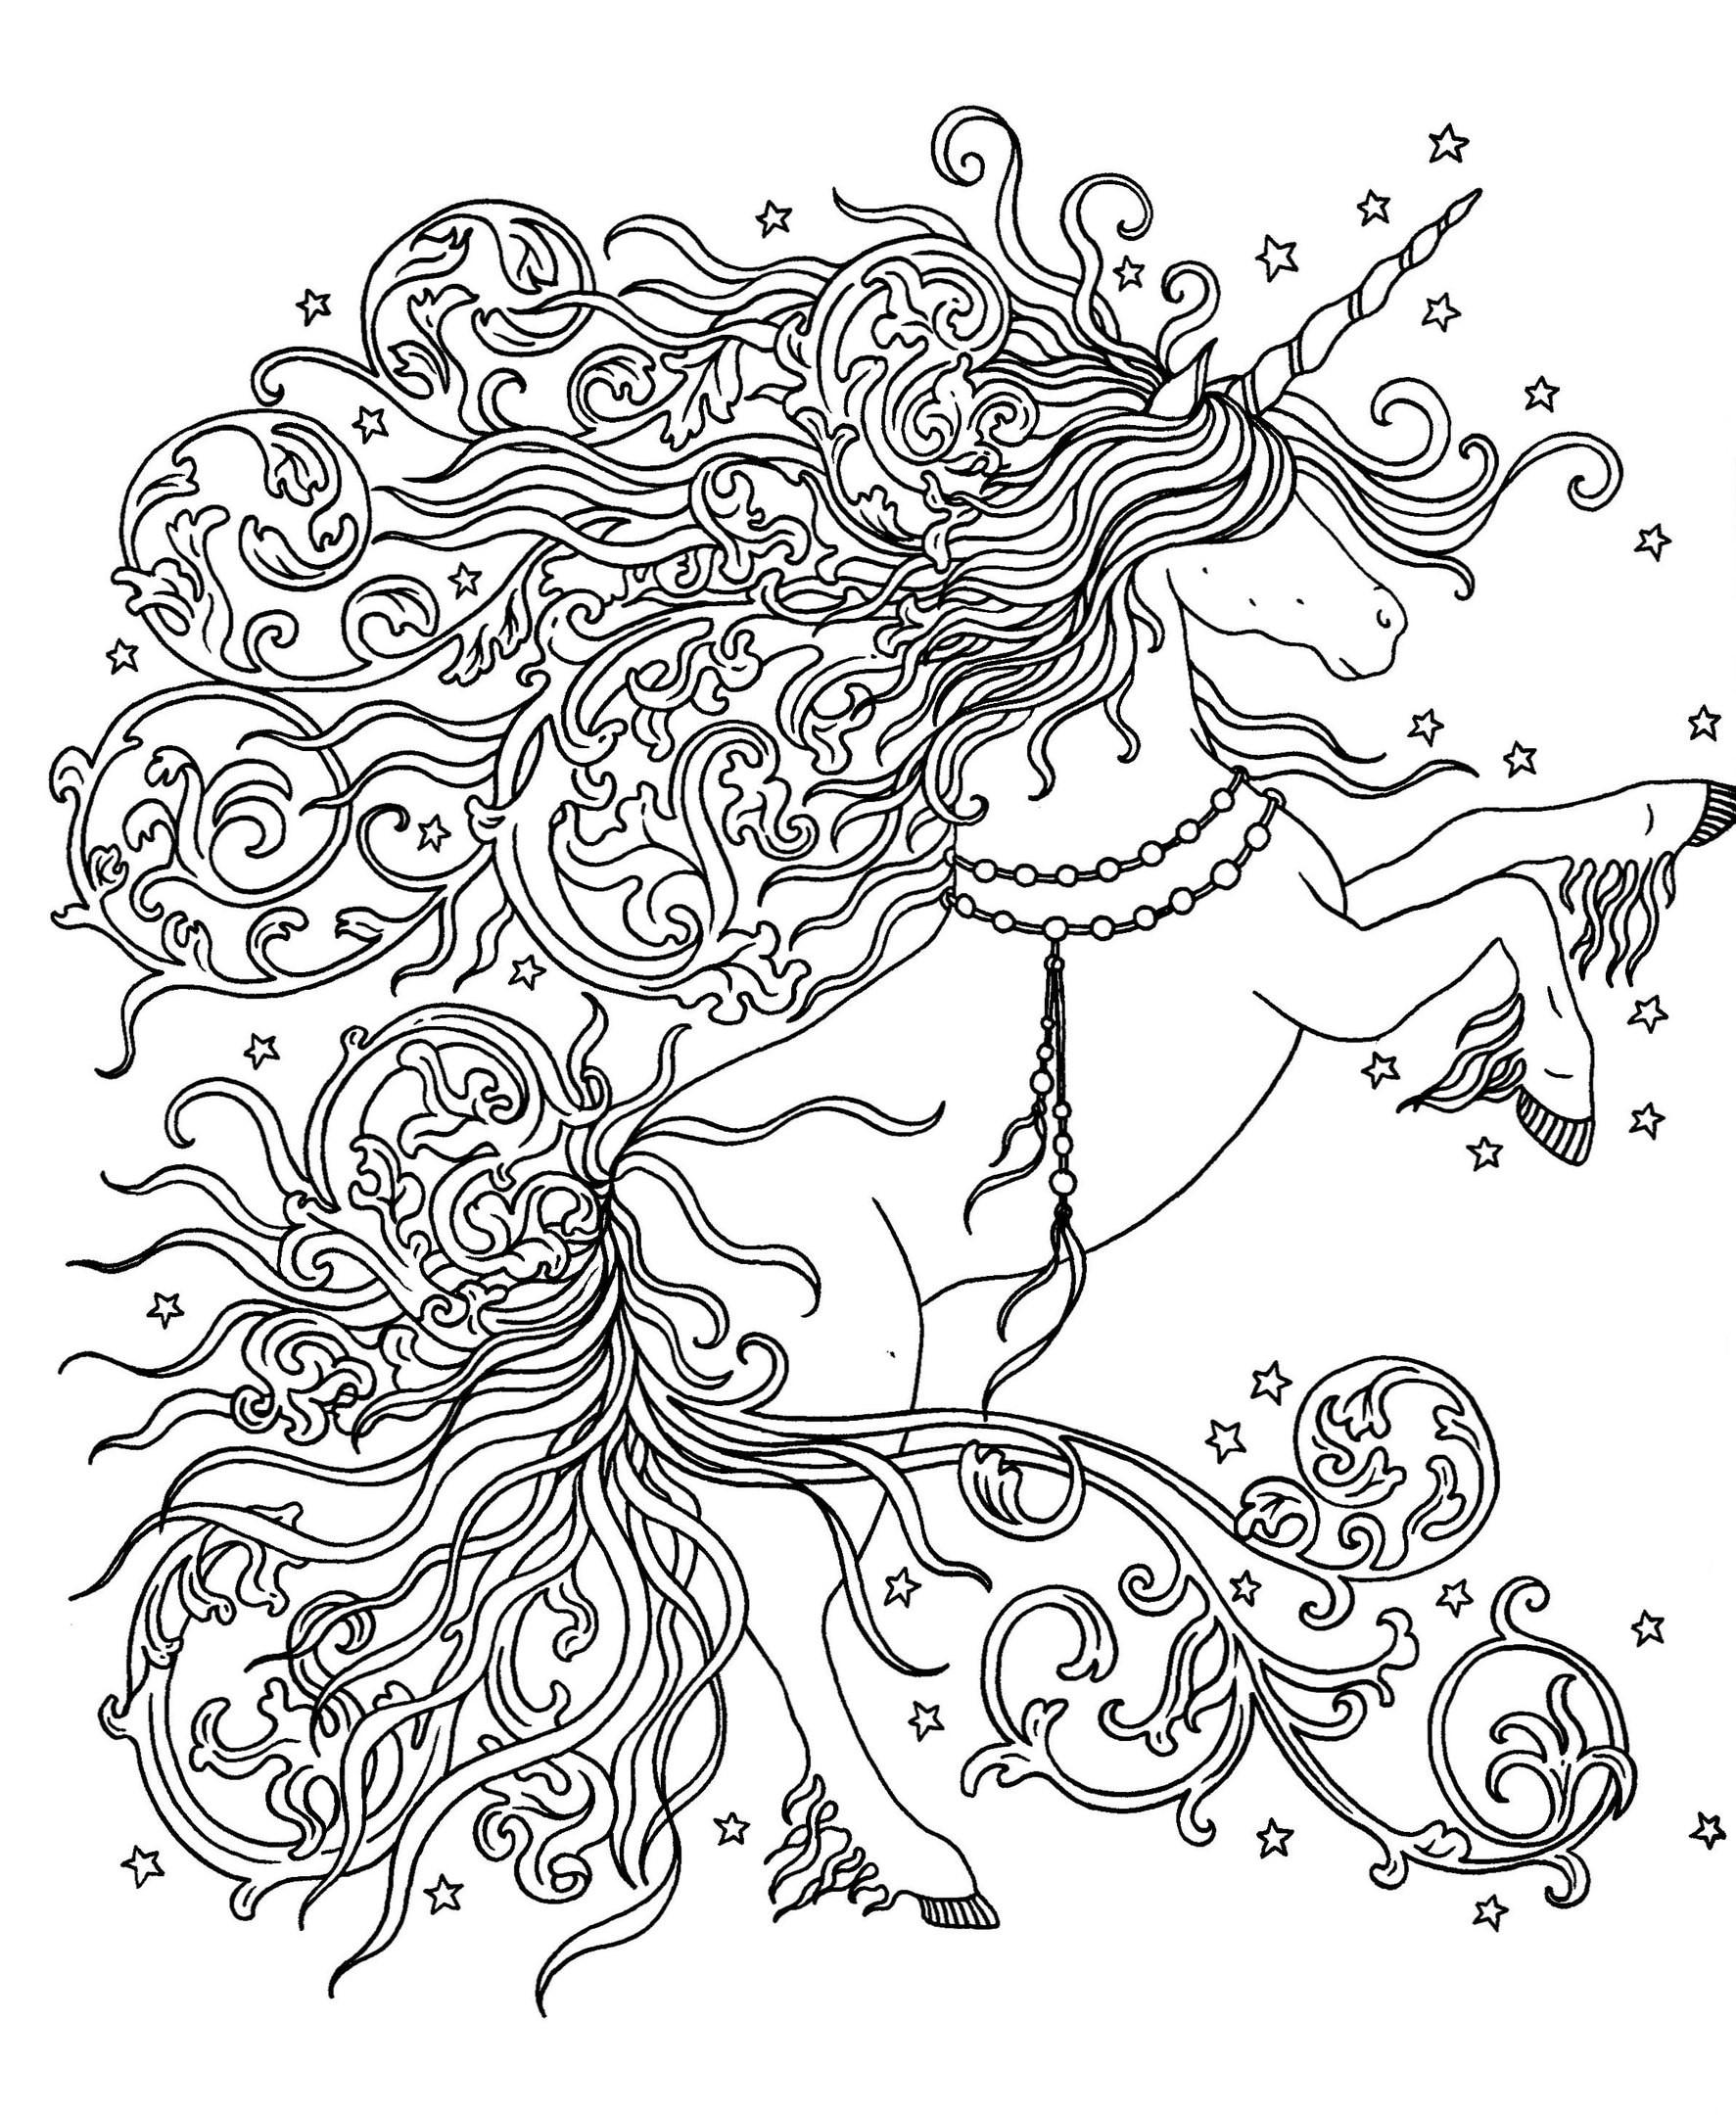 A unicorn with a magical mane